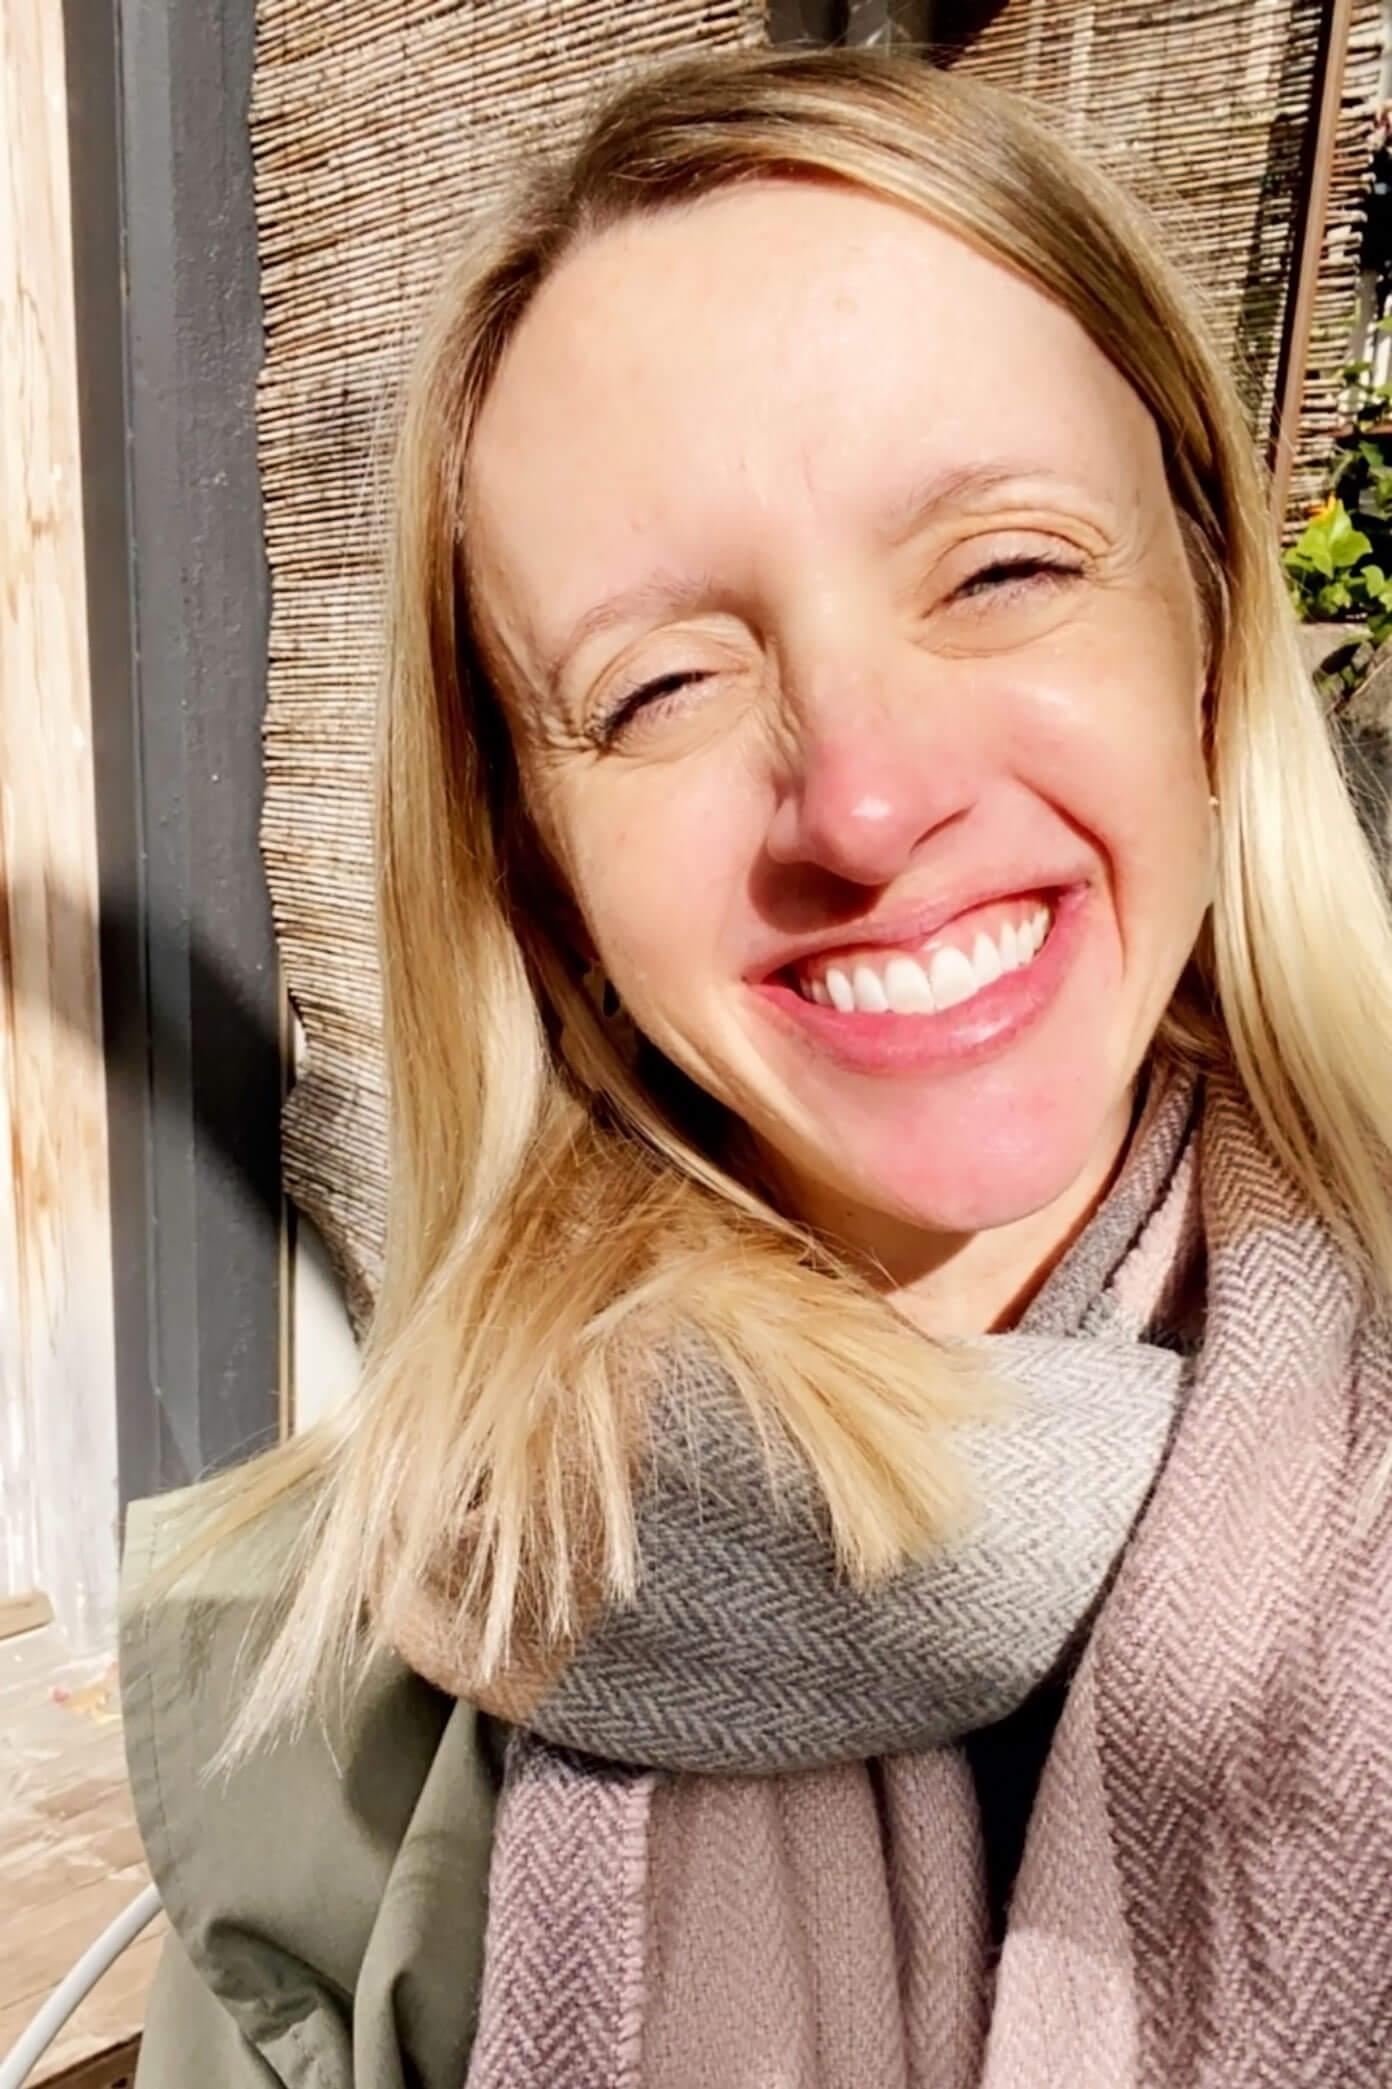 Squinty terrace selfie